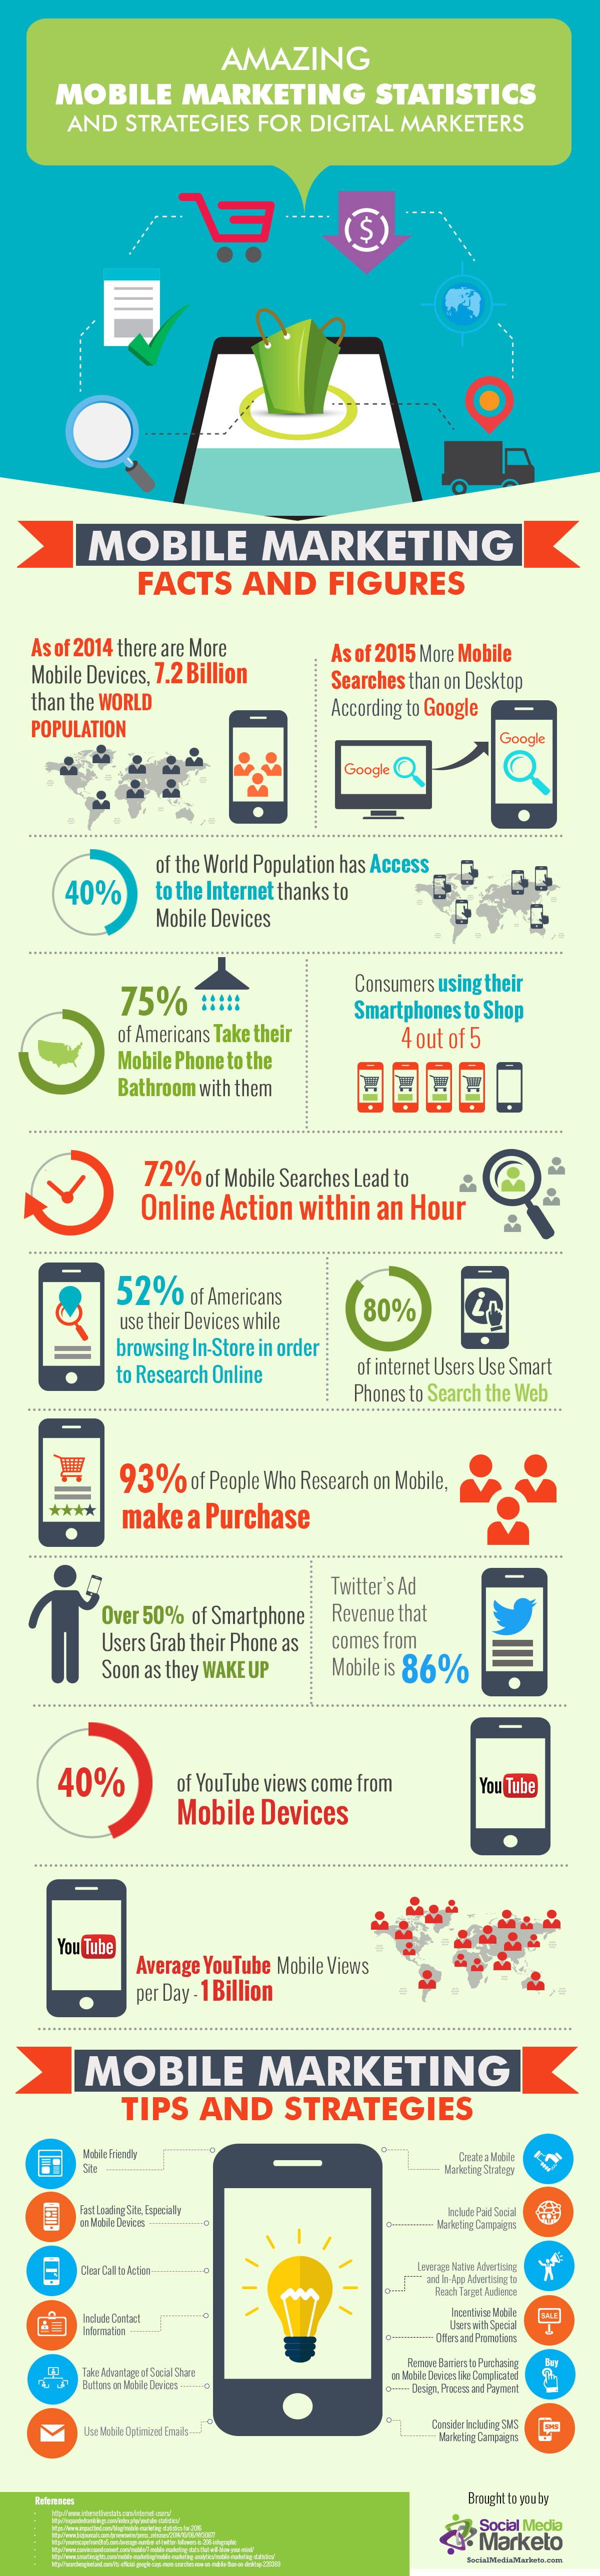 Amazing Mobile Marketing Statistics Infographic